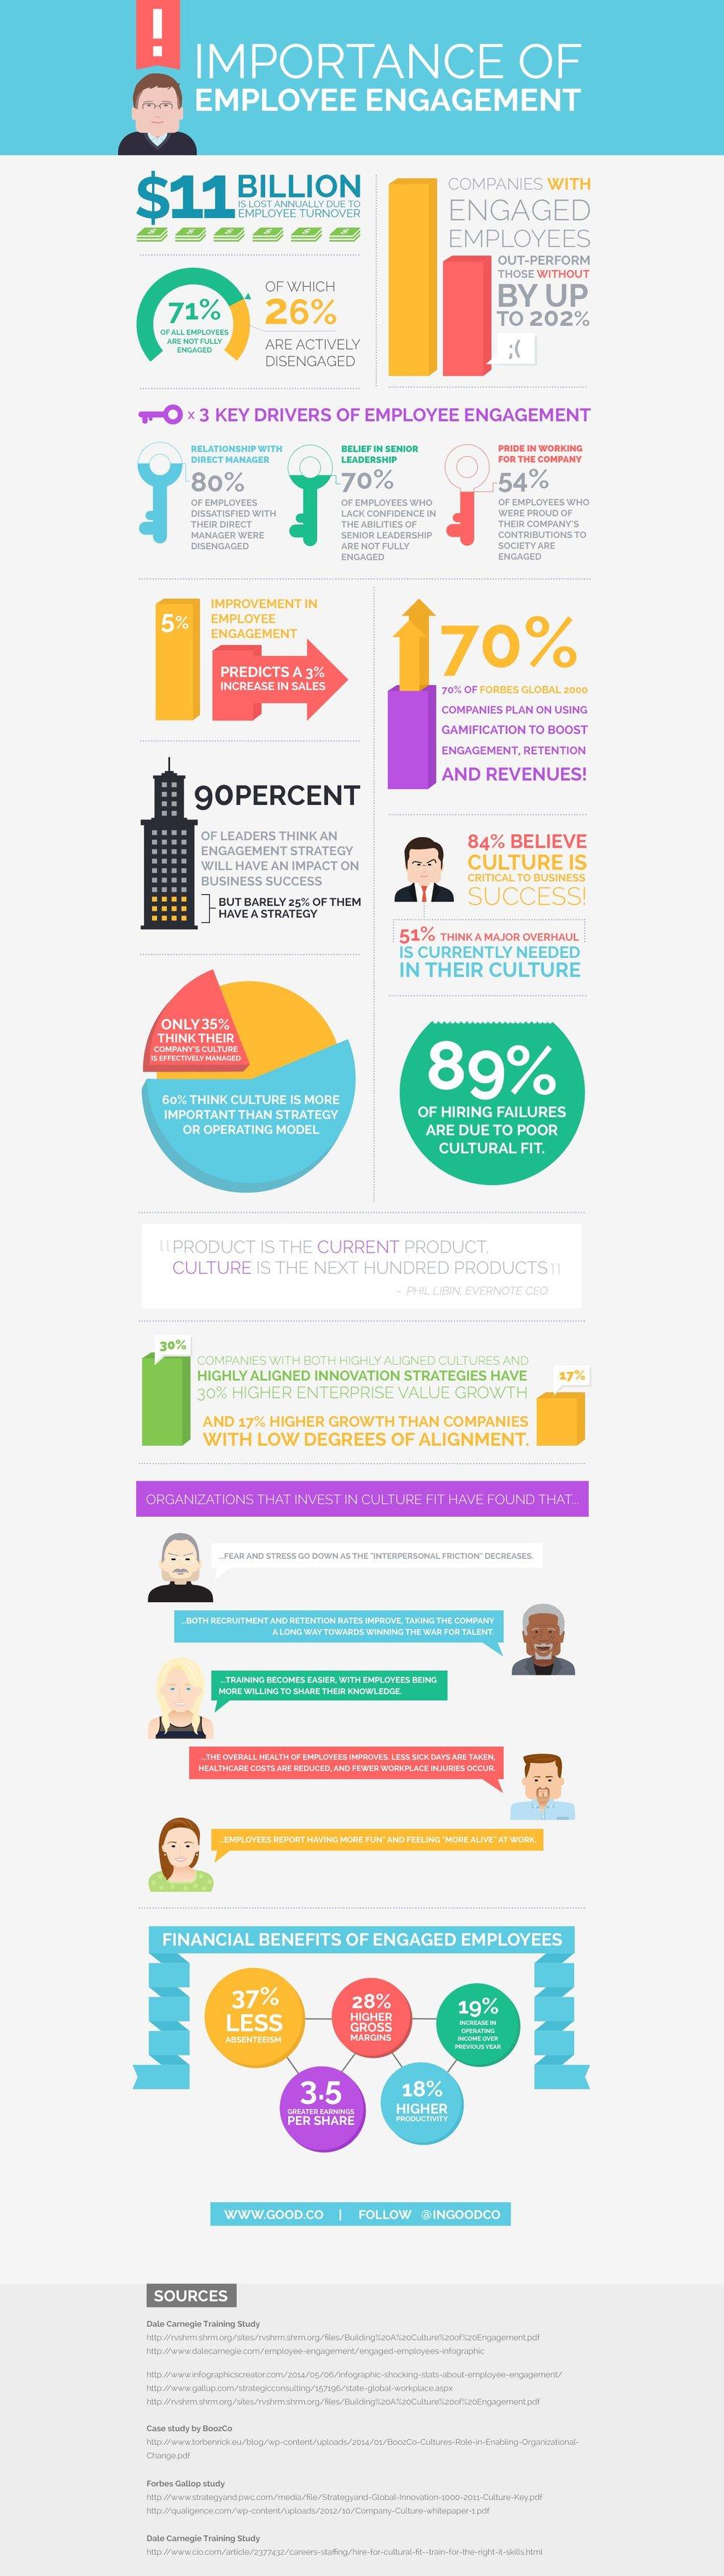 Importance of Employee Engagement